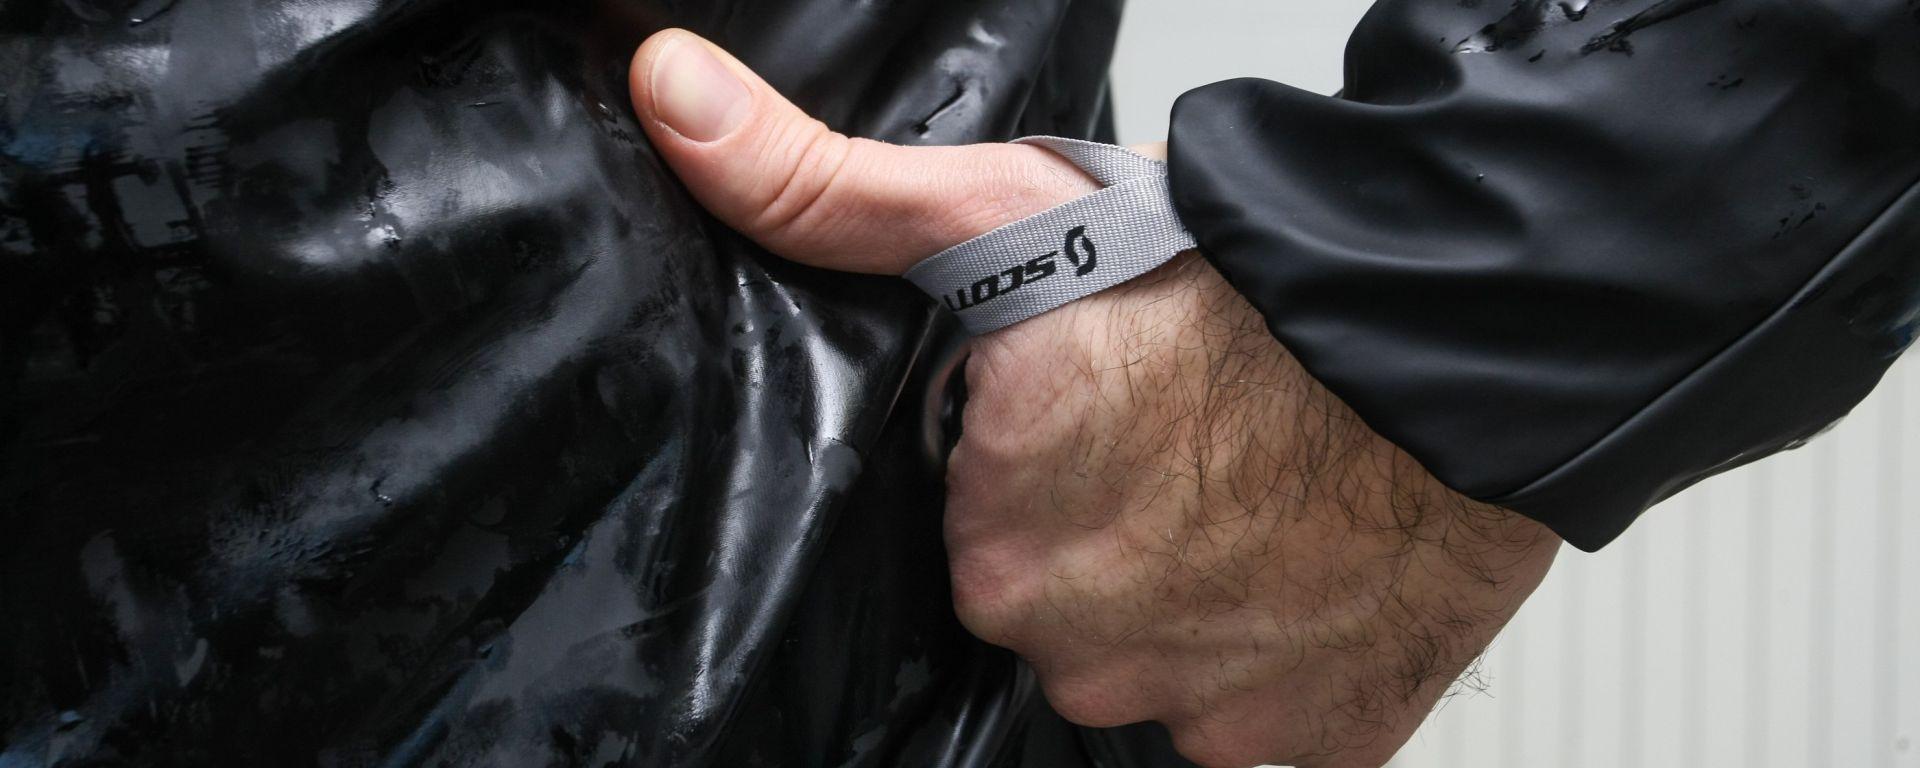 Scott: giacca e pantaloni PRO DP Rain, guanti Distinct 1 GP